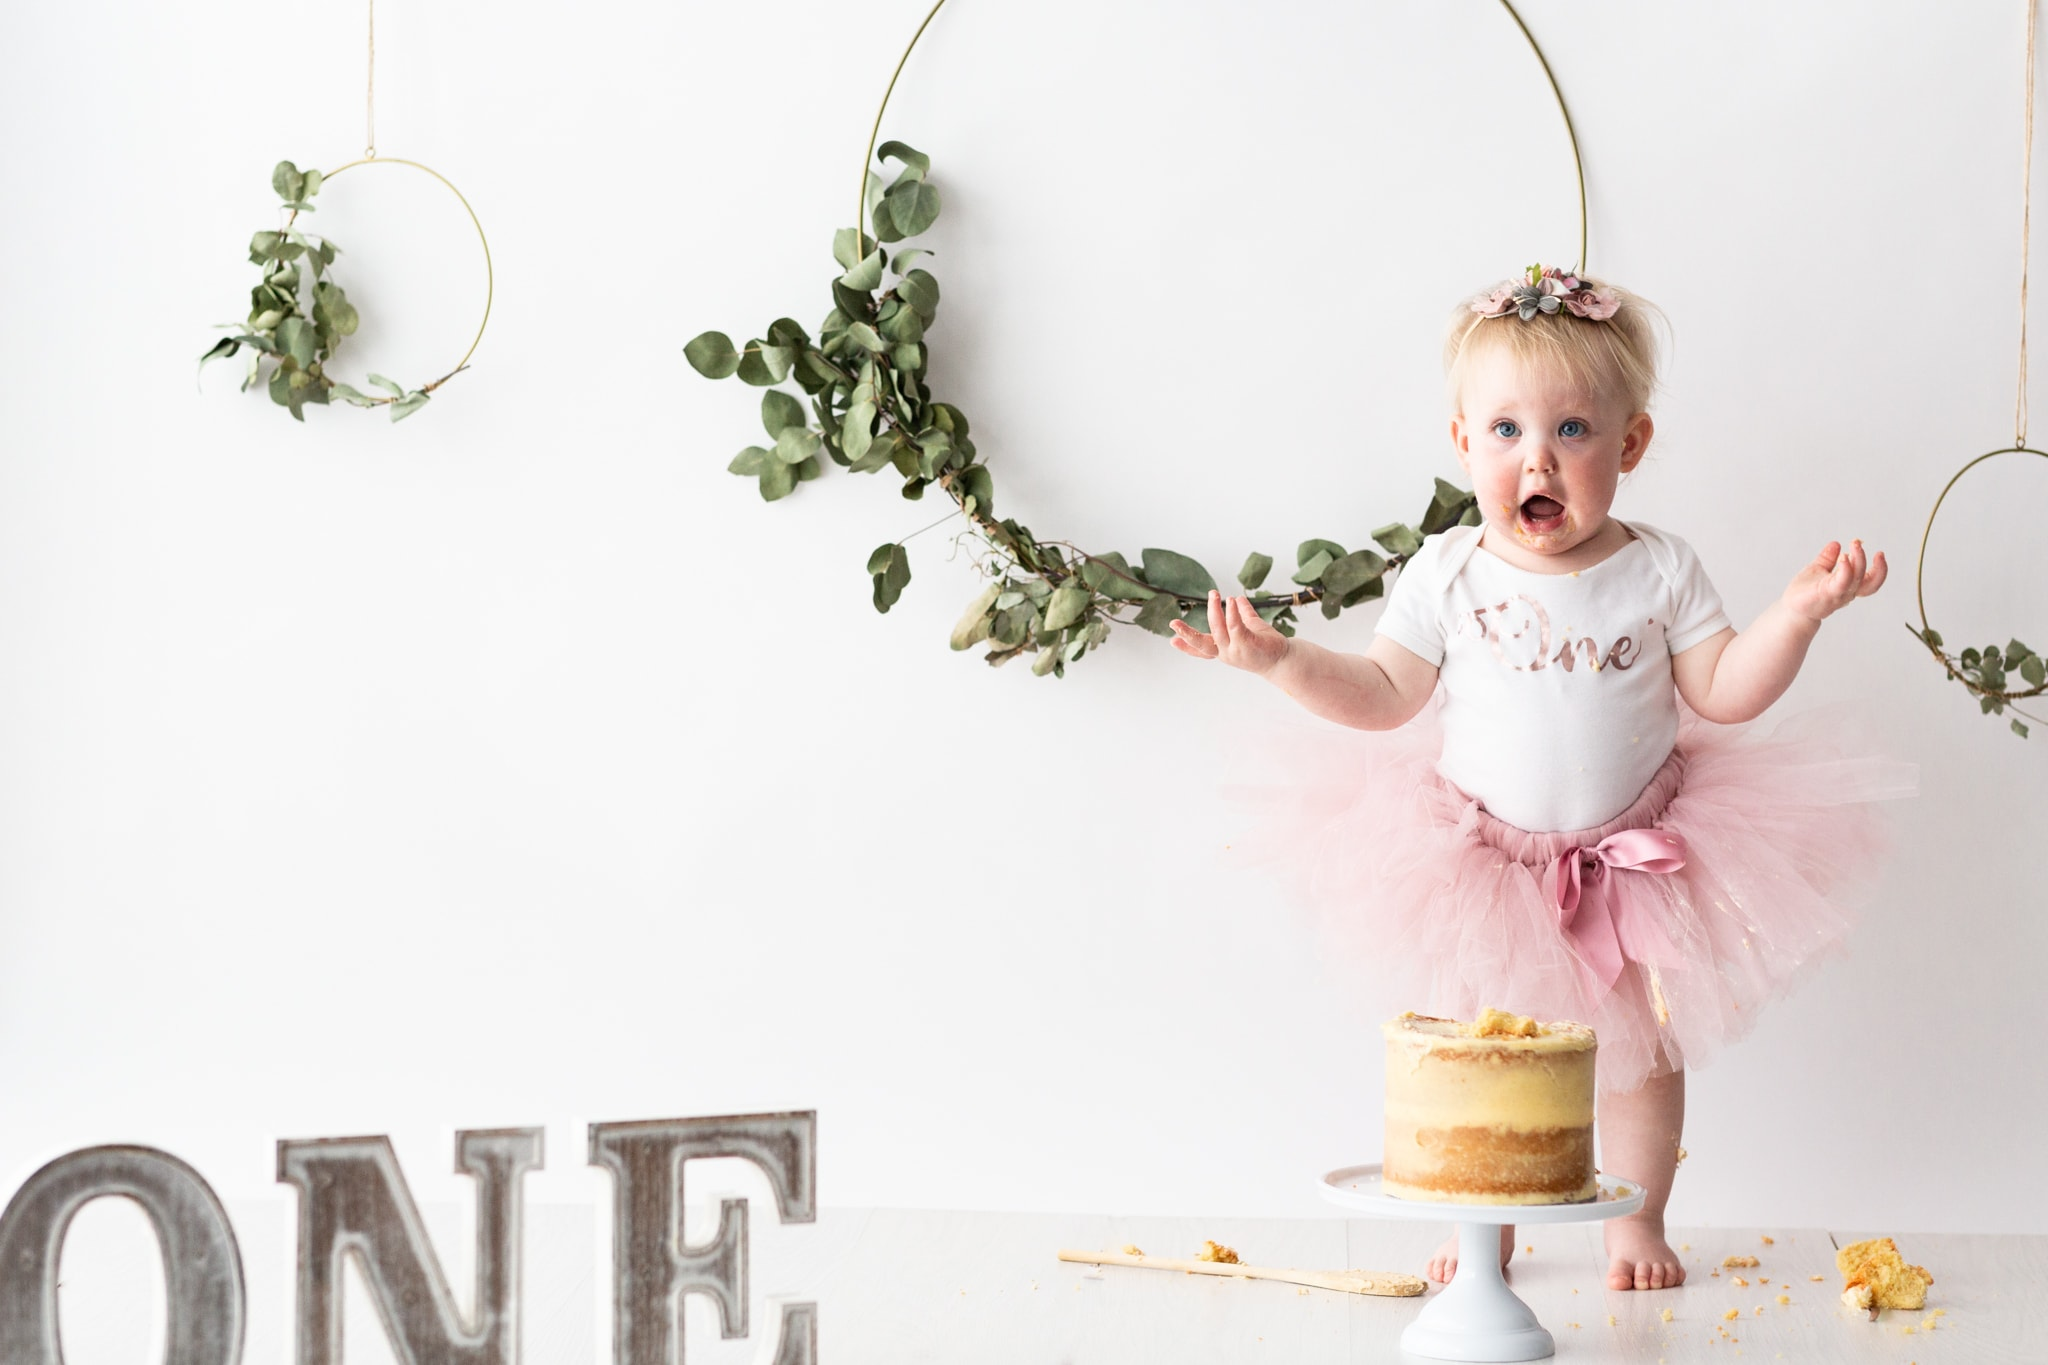 first birthday Kent cake smash photoshoot in Bexley little girl in tutu